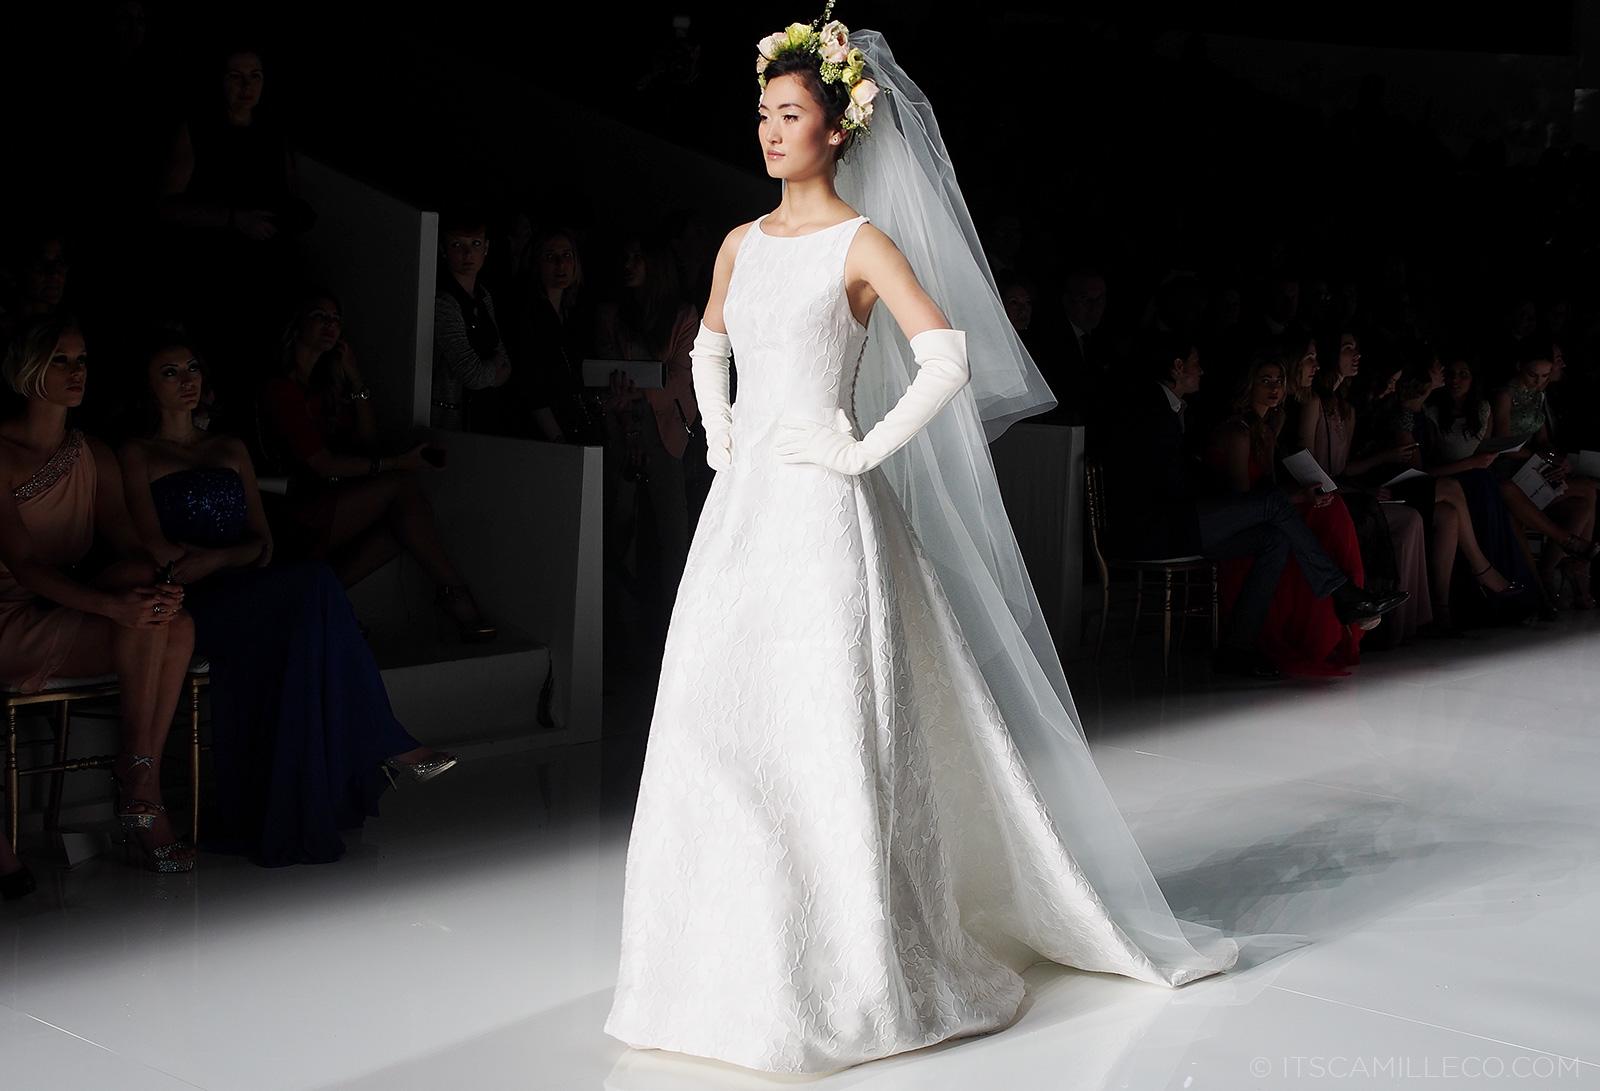 Simplest Wedding Dress 72 Stunning itscamilleco